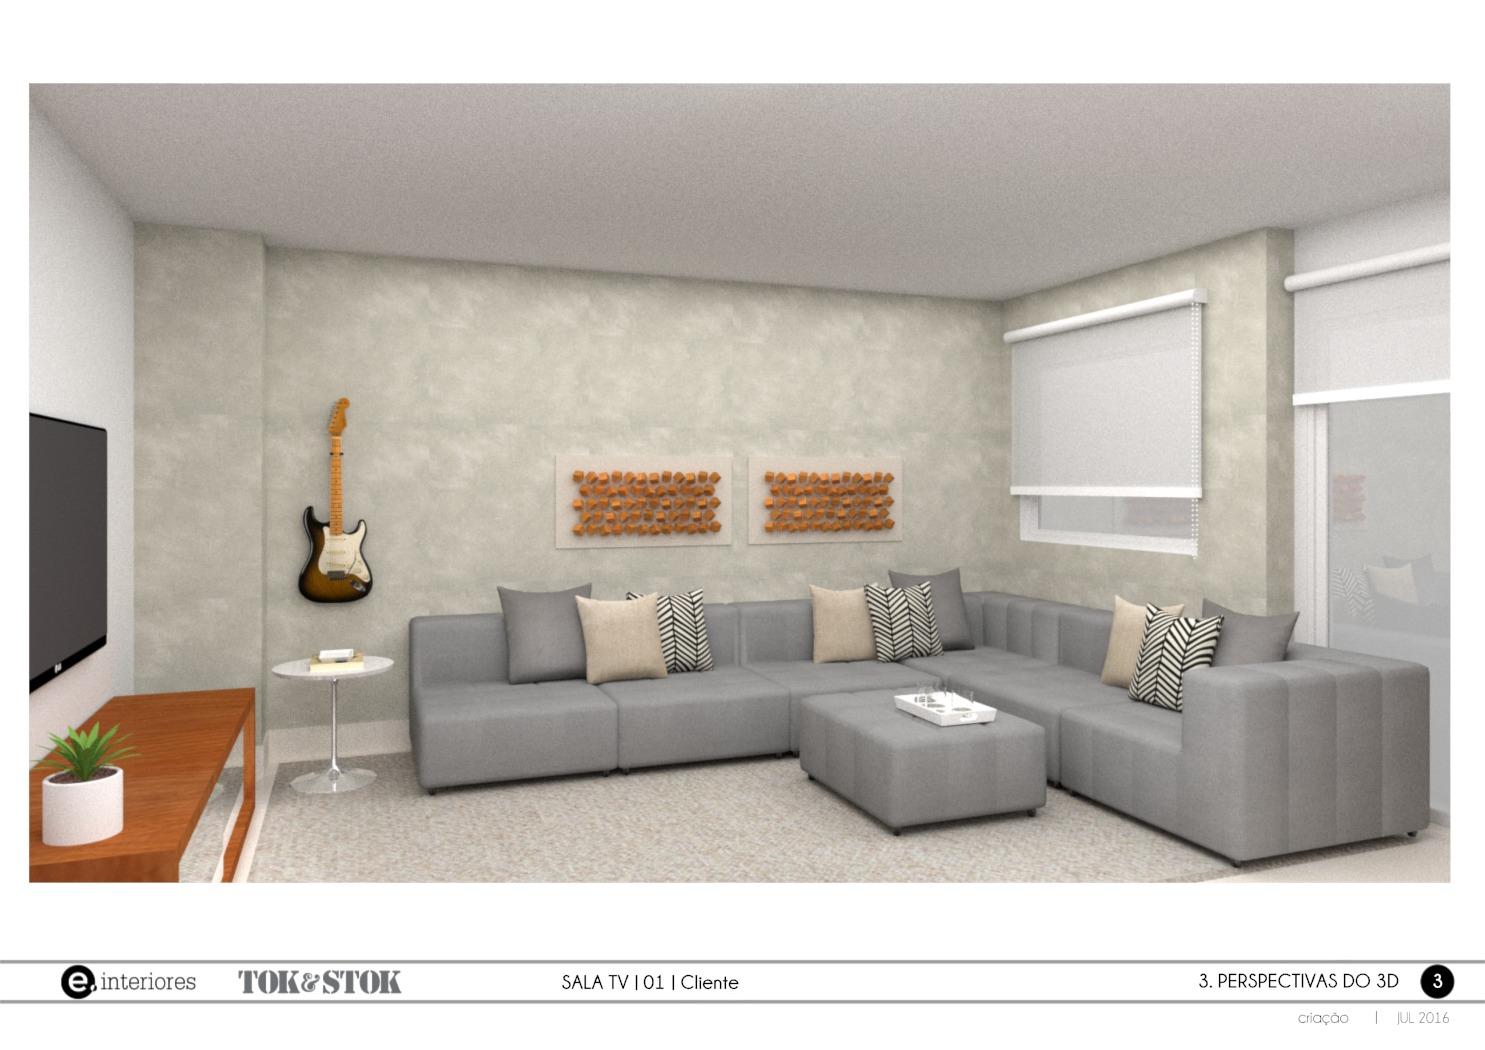 e interiores next generation interior design with blender e interiores next generation interior design with blender